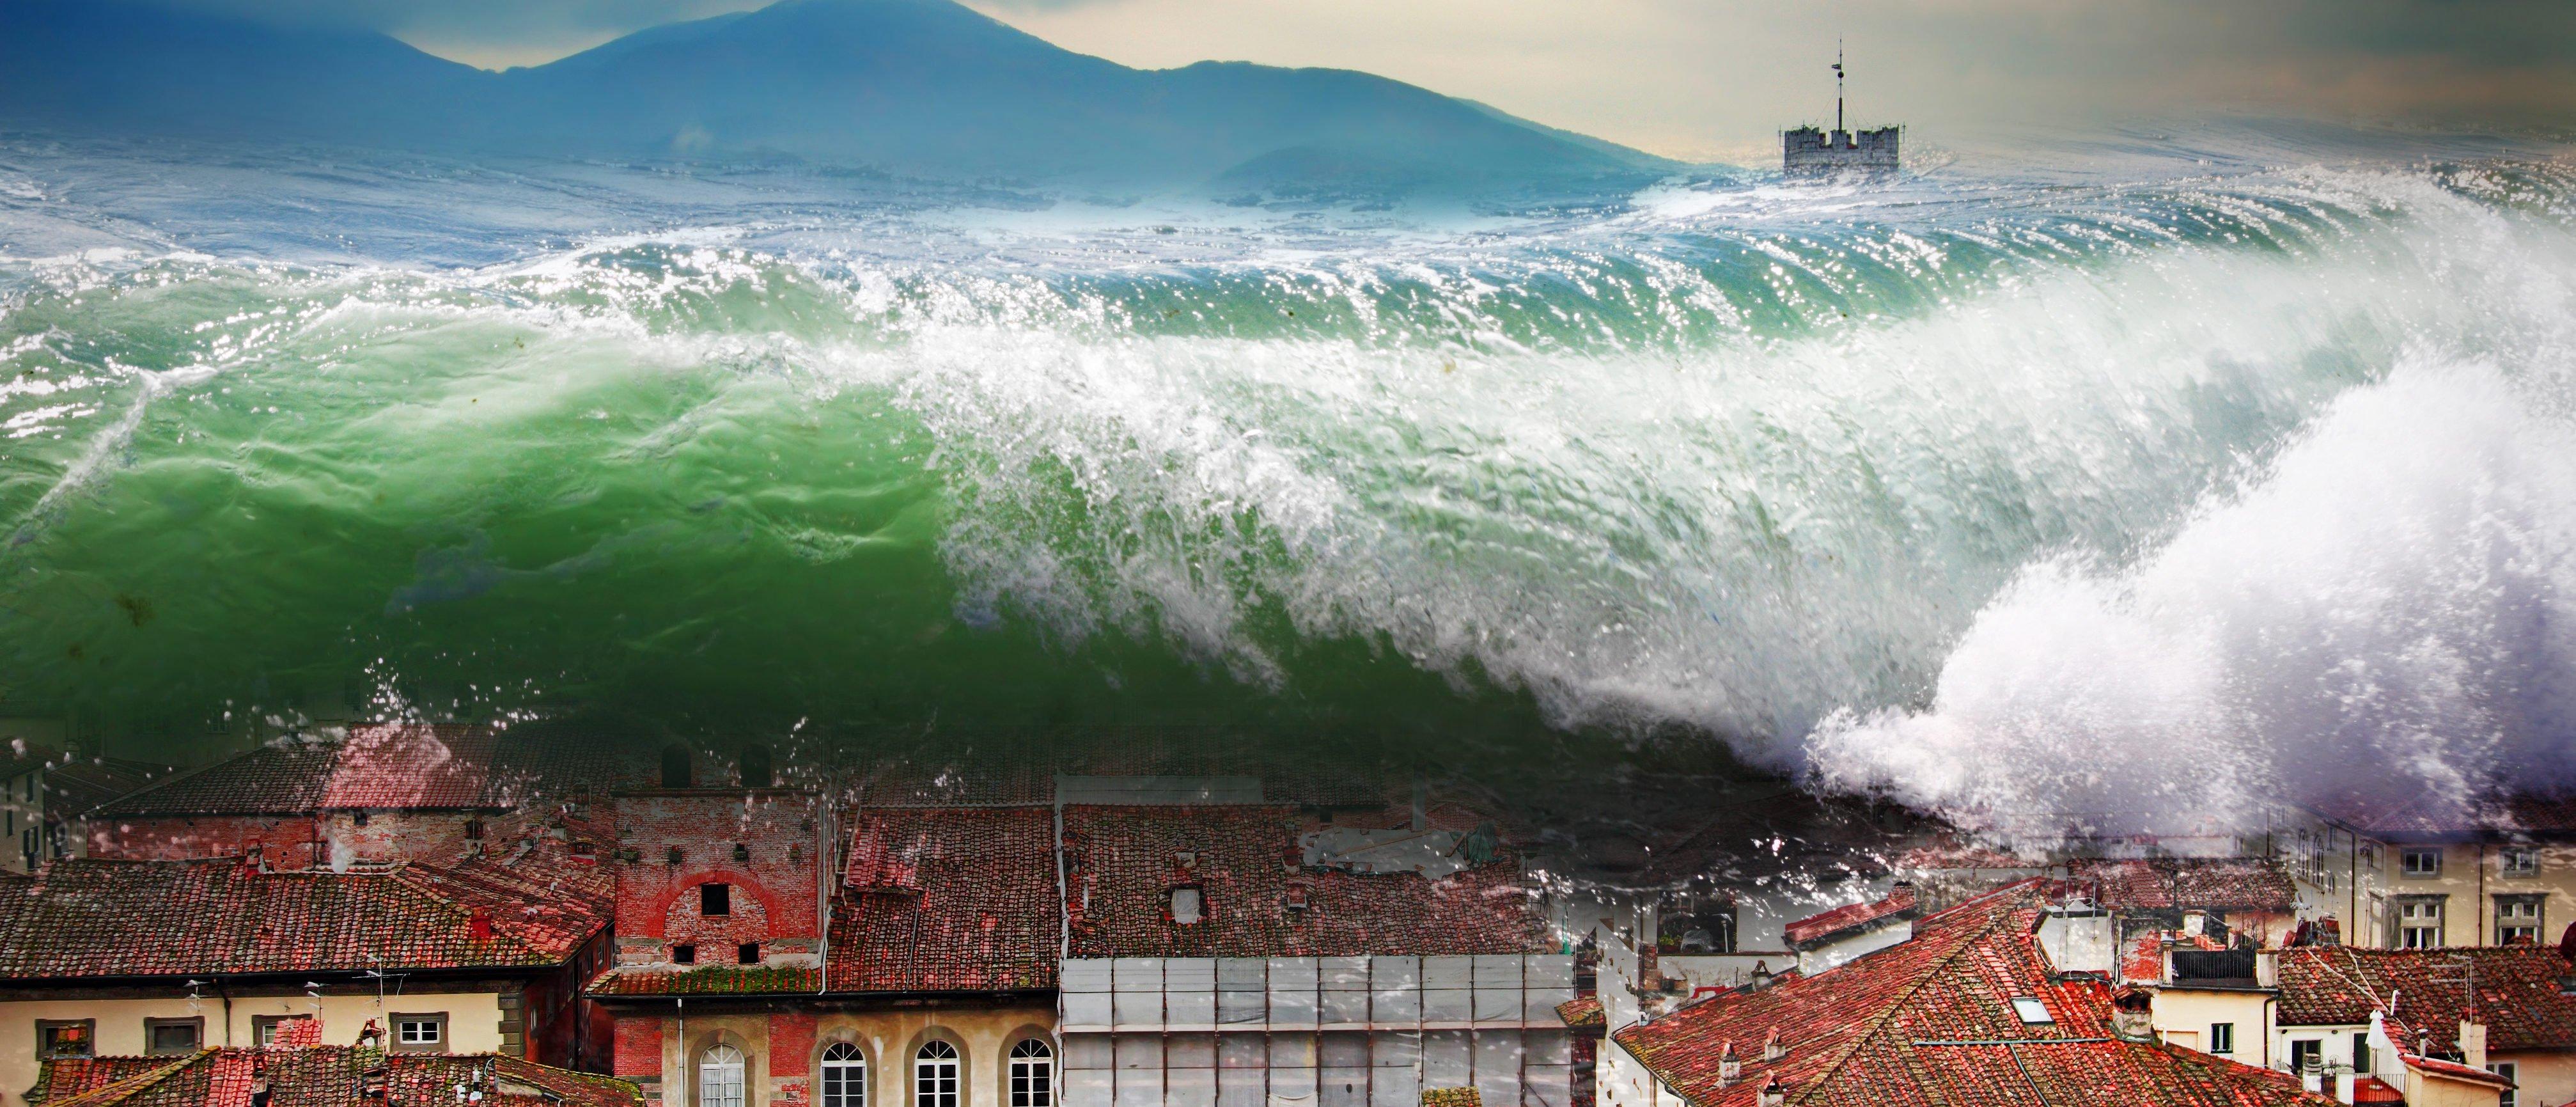 Giant wave crashing above the city. Global flood. (Shutterstock/iryna1)